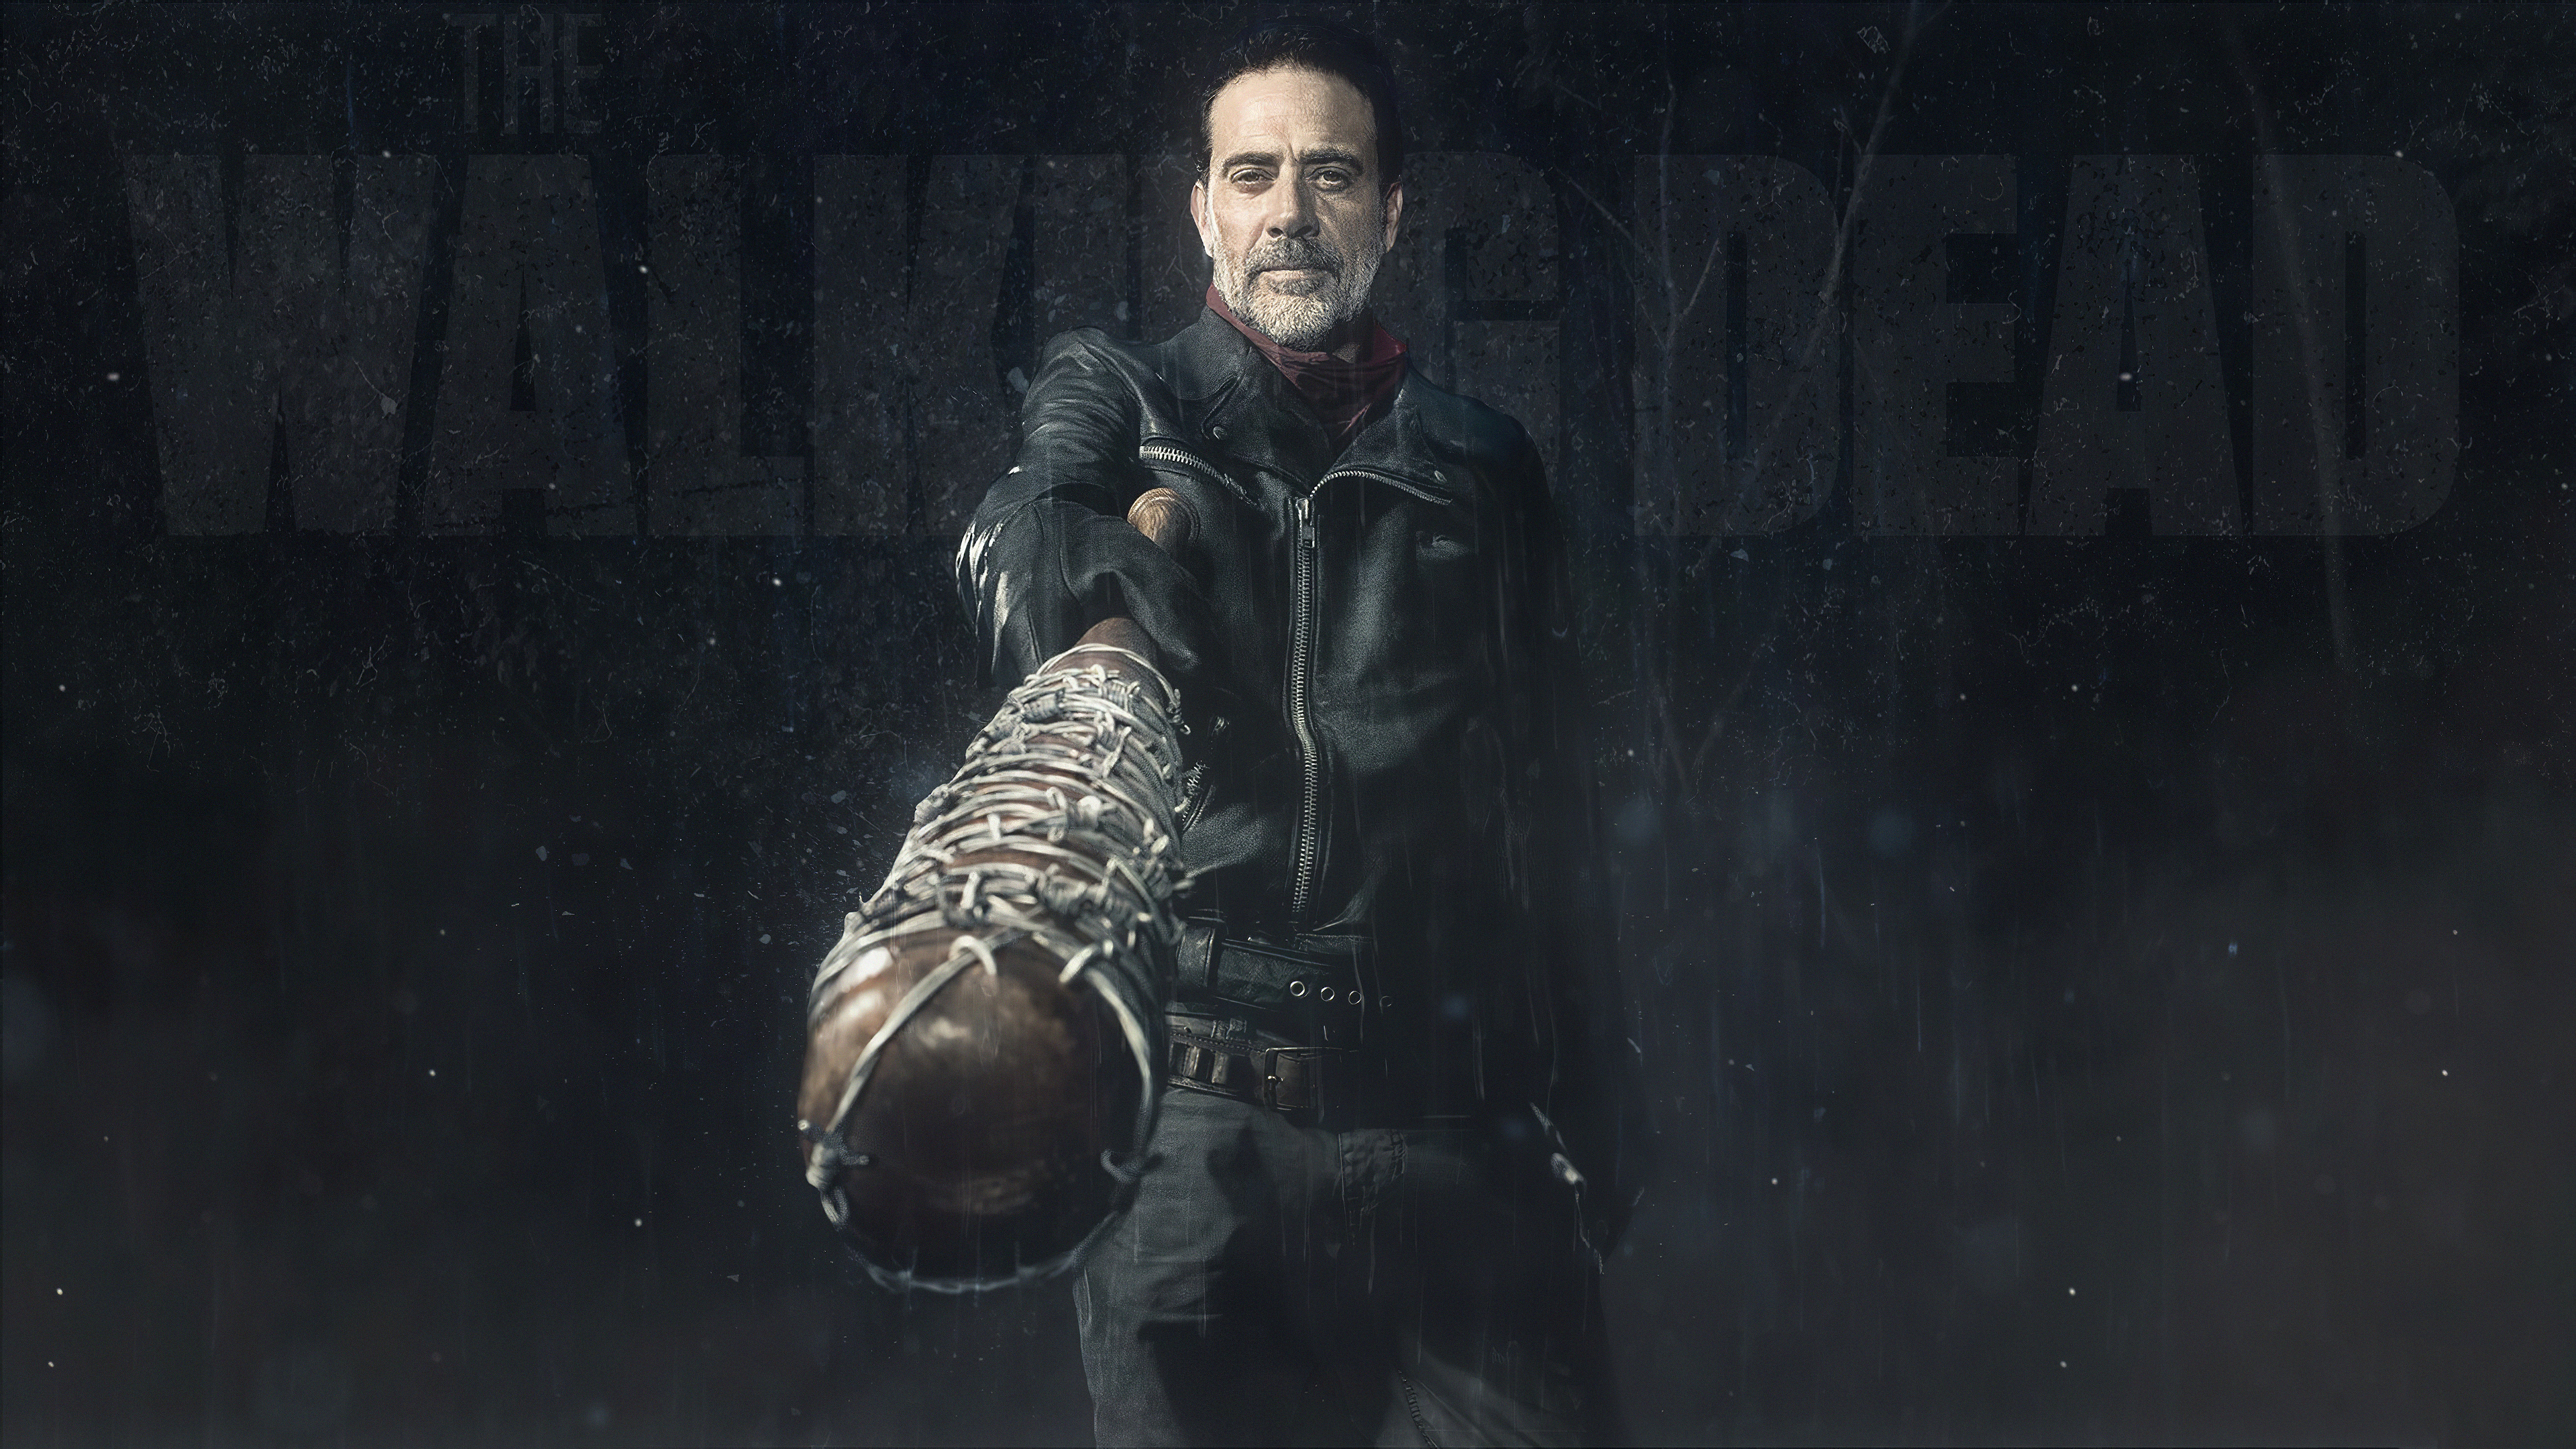 walking dead 2019 1578253245 - Walking Dead 2019 - Walking Dead 4k wallpaper